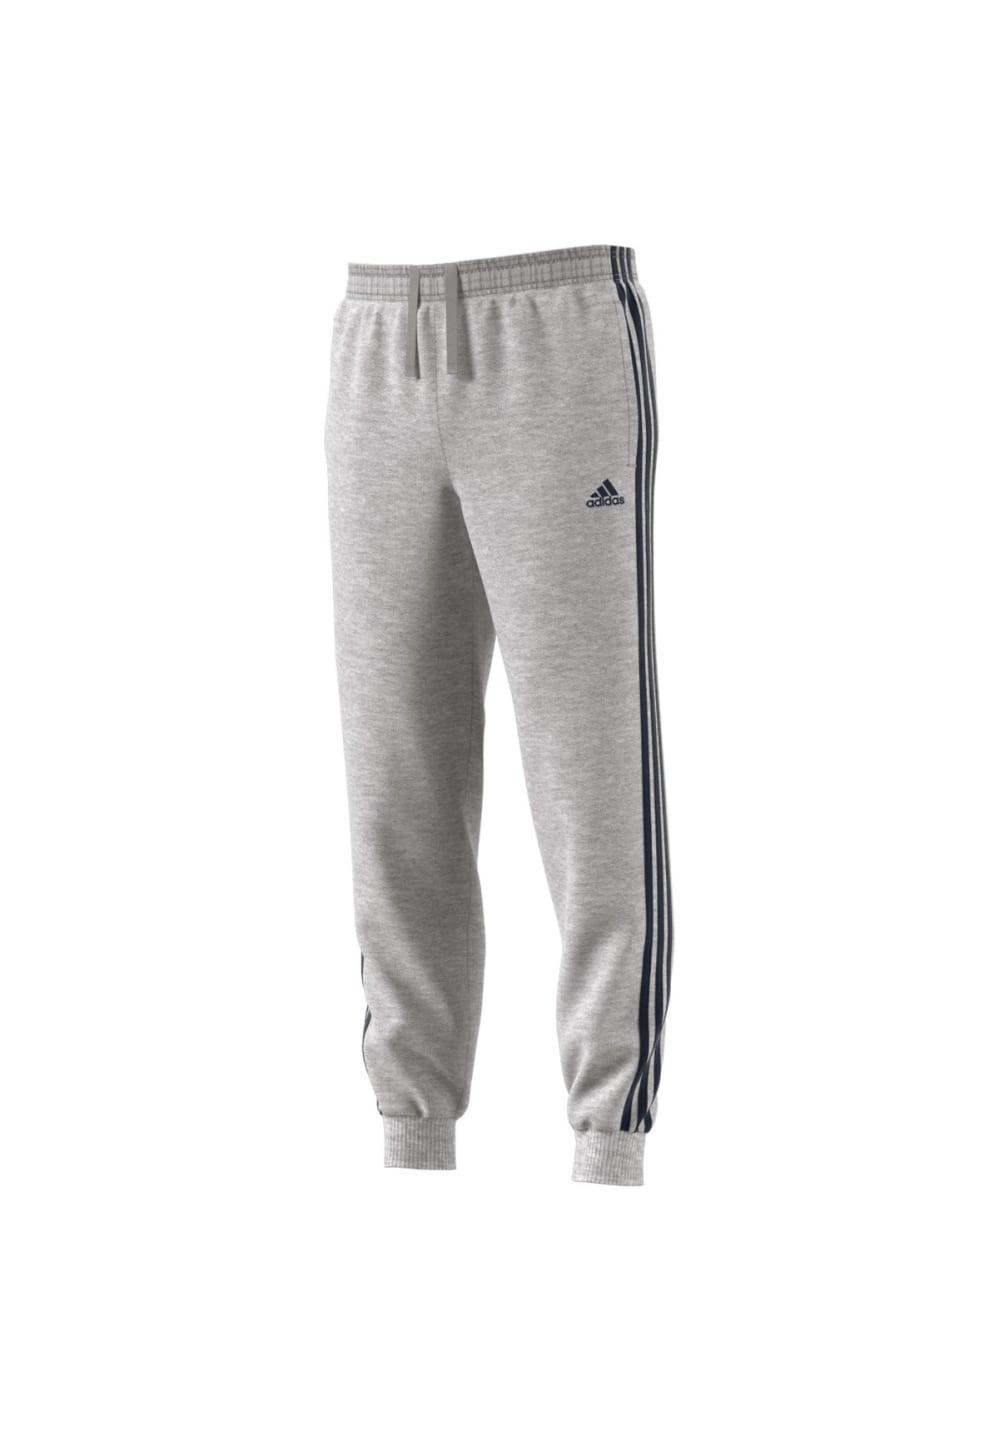 adidas Essentials 3-Stripes Jogger Pants - Fitness ...